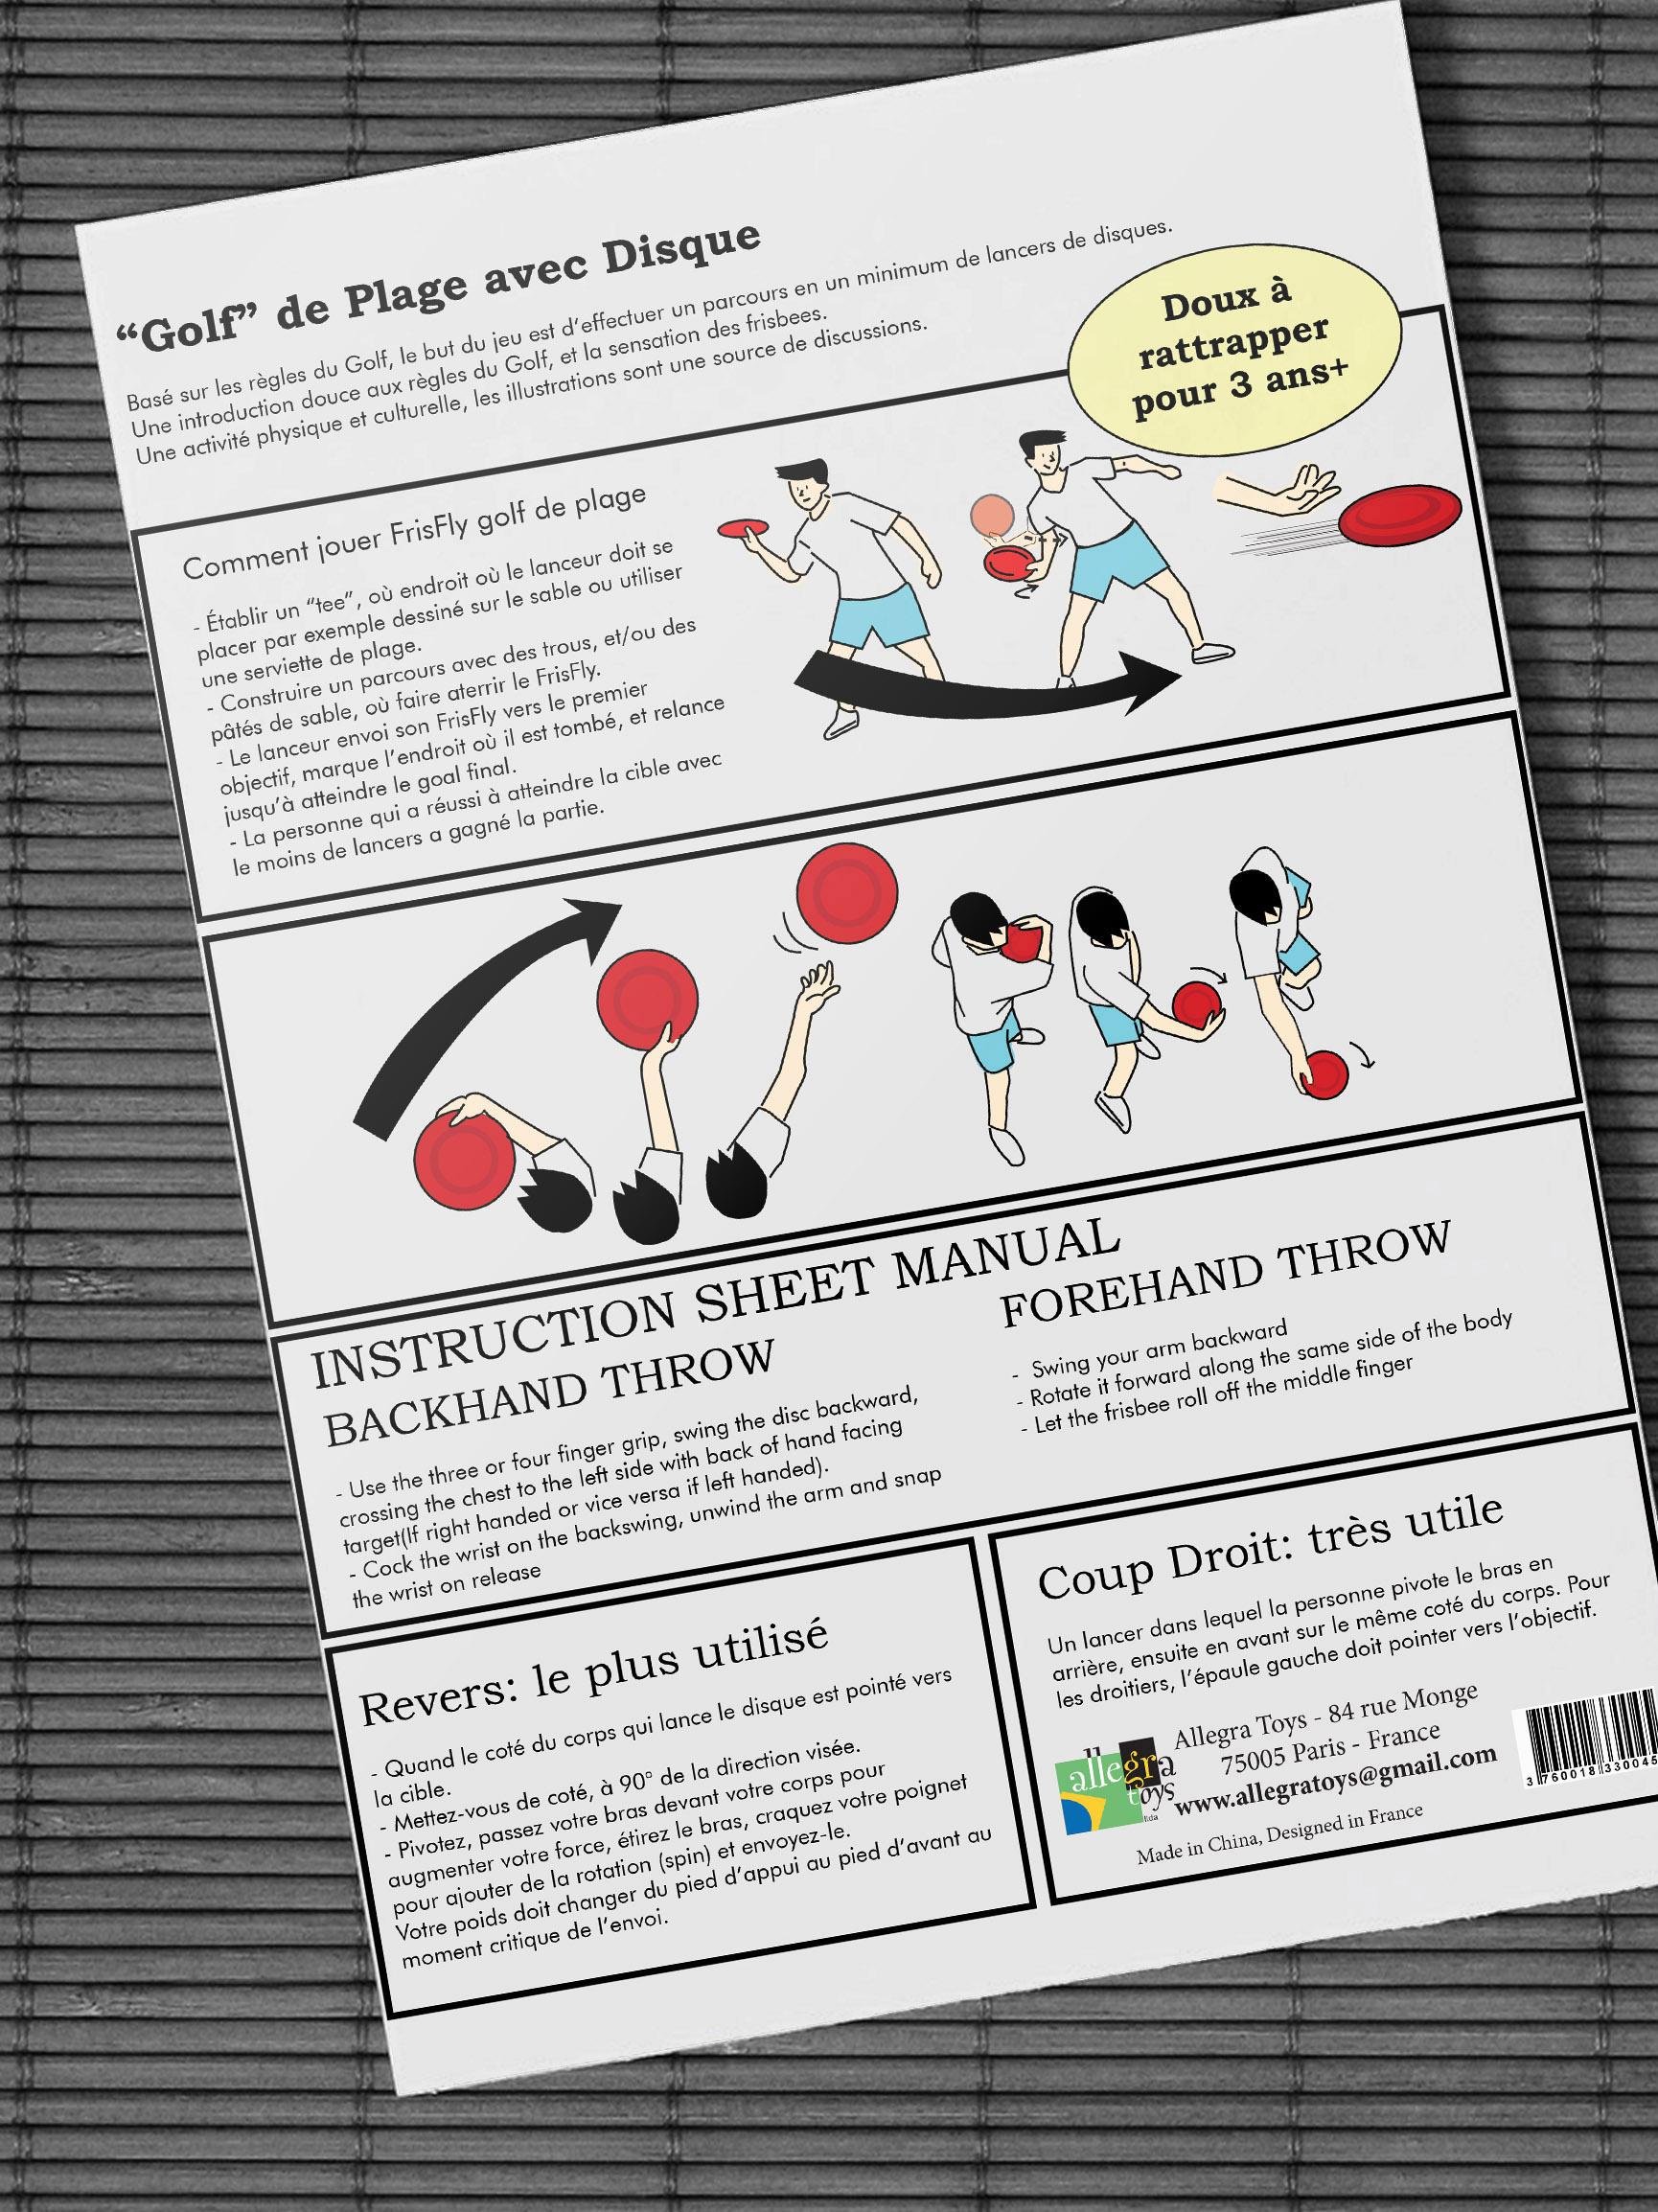 Du 640 manual array illustrations for frisbee manual instructions u2013 michelle rh portfoliochen com fandeluxe Choice Image